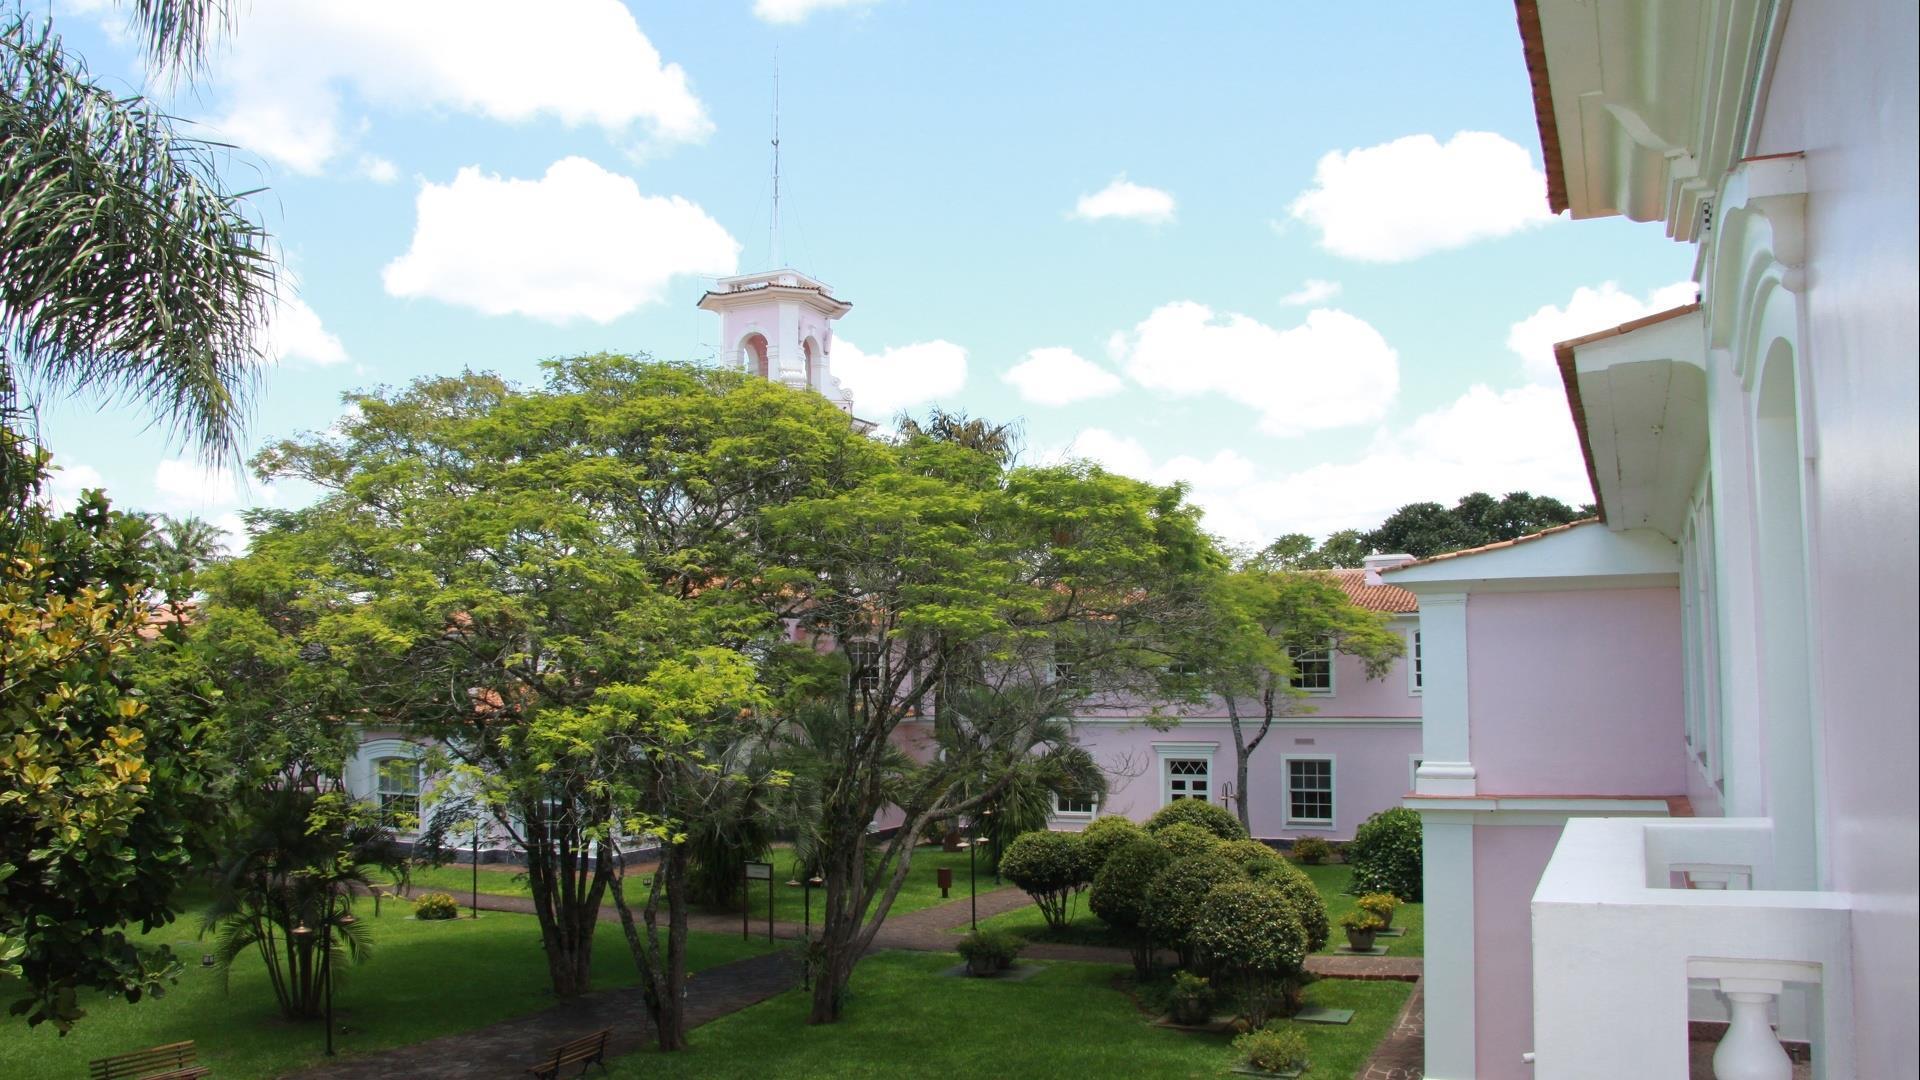 Belmond Hotel das Cataratas, a deluxe hotel in Foz do Iguacu, South Brazil